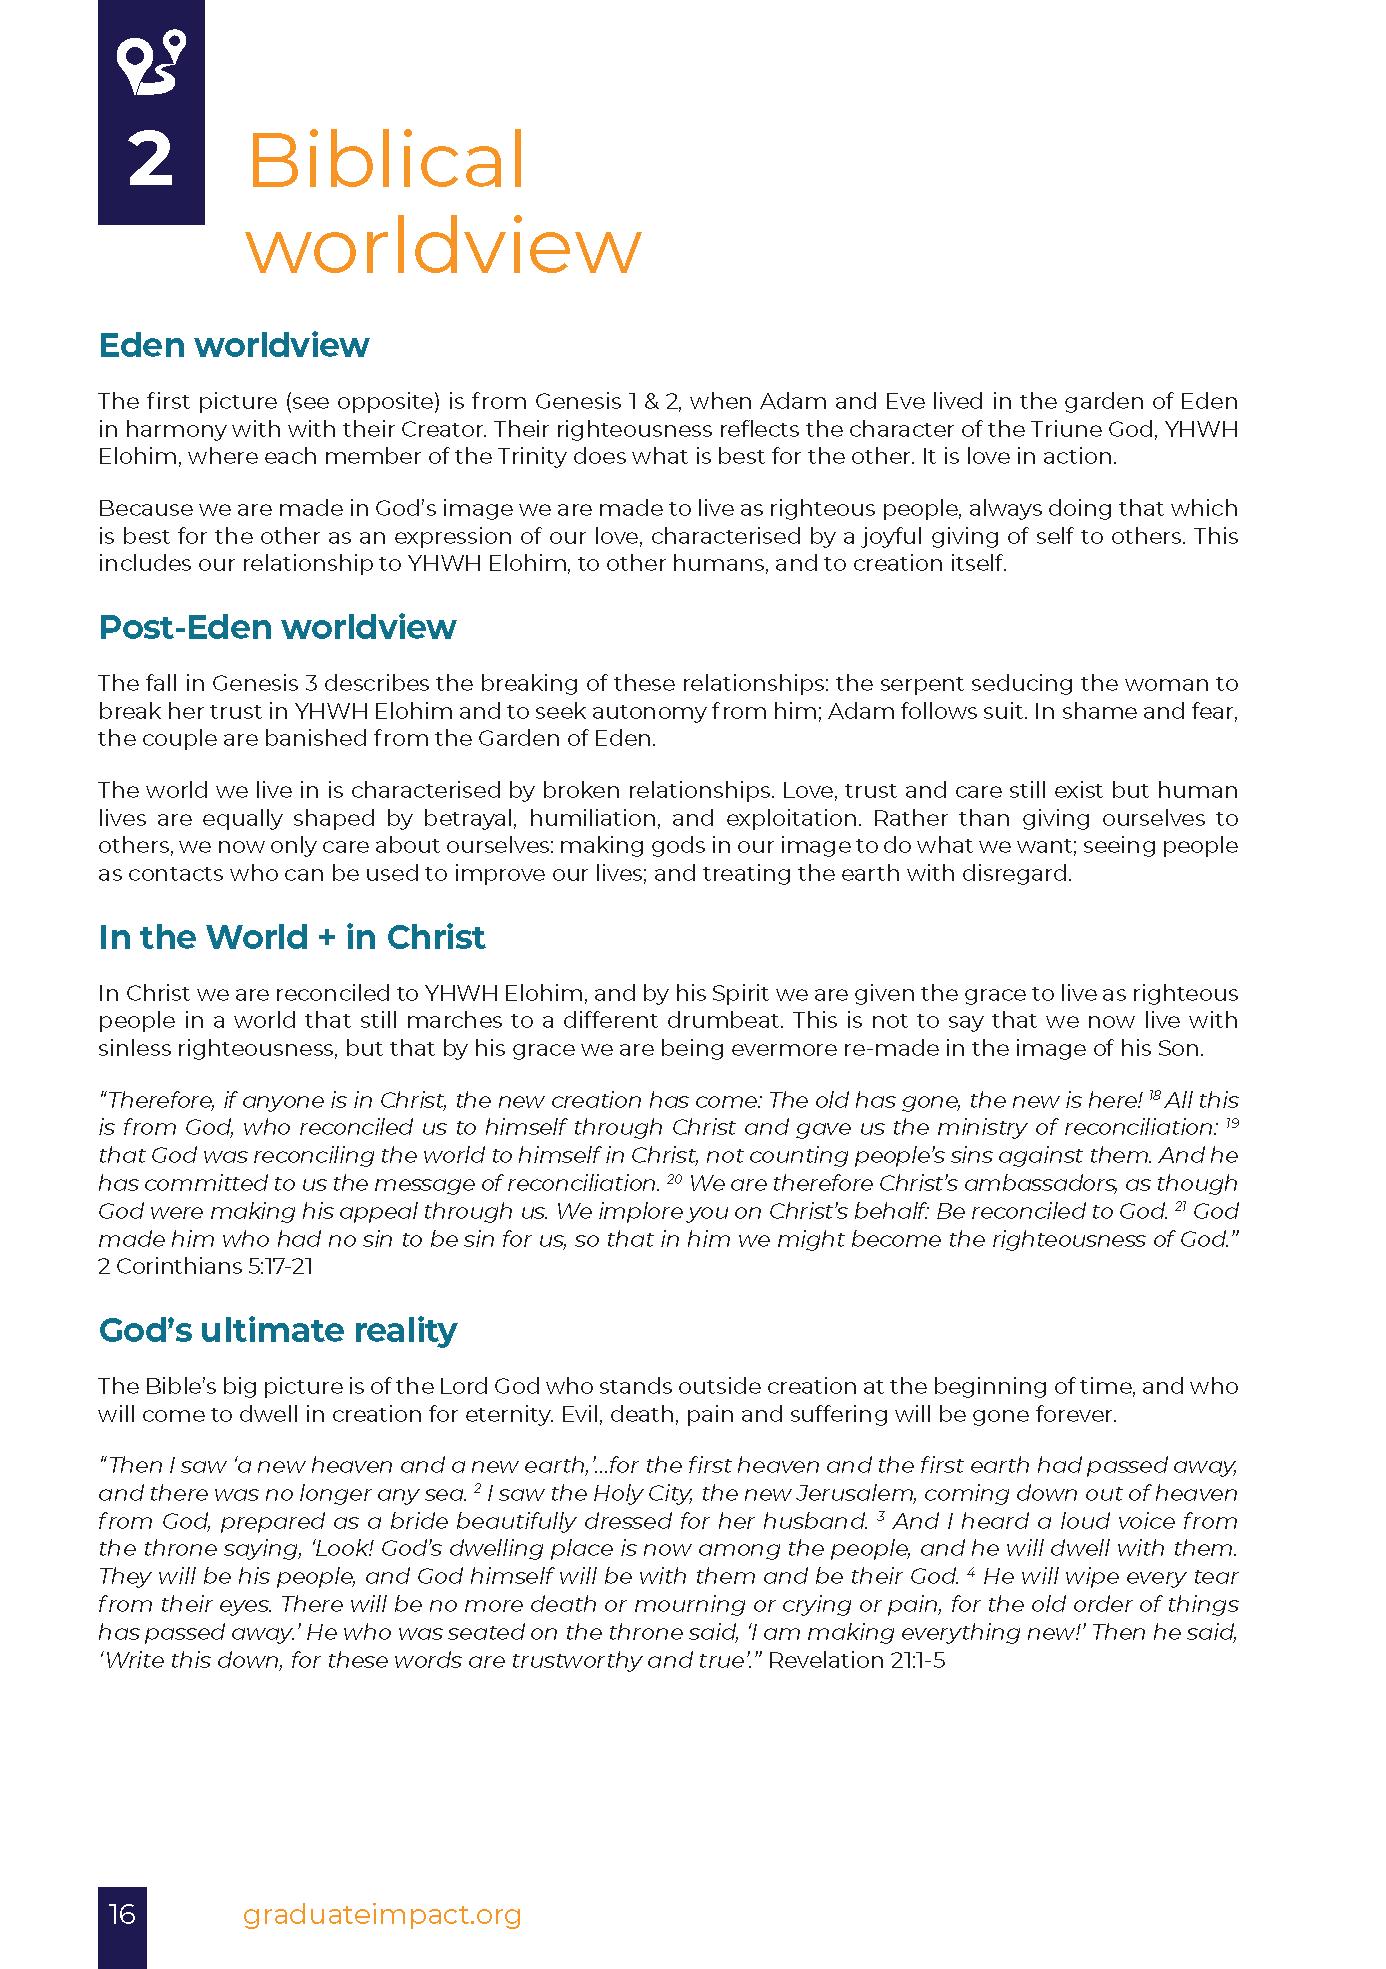 Cross-Current Resources — IFES GRADUATEiMPACT